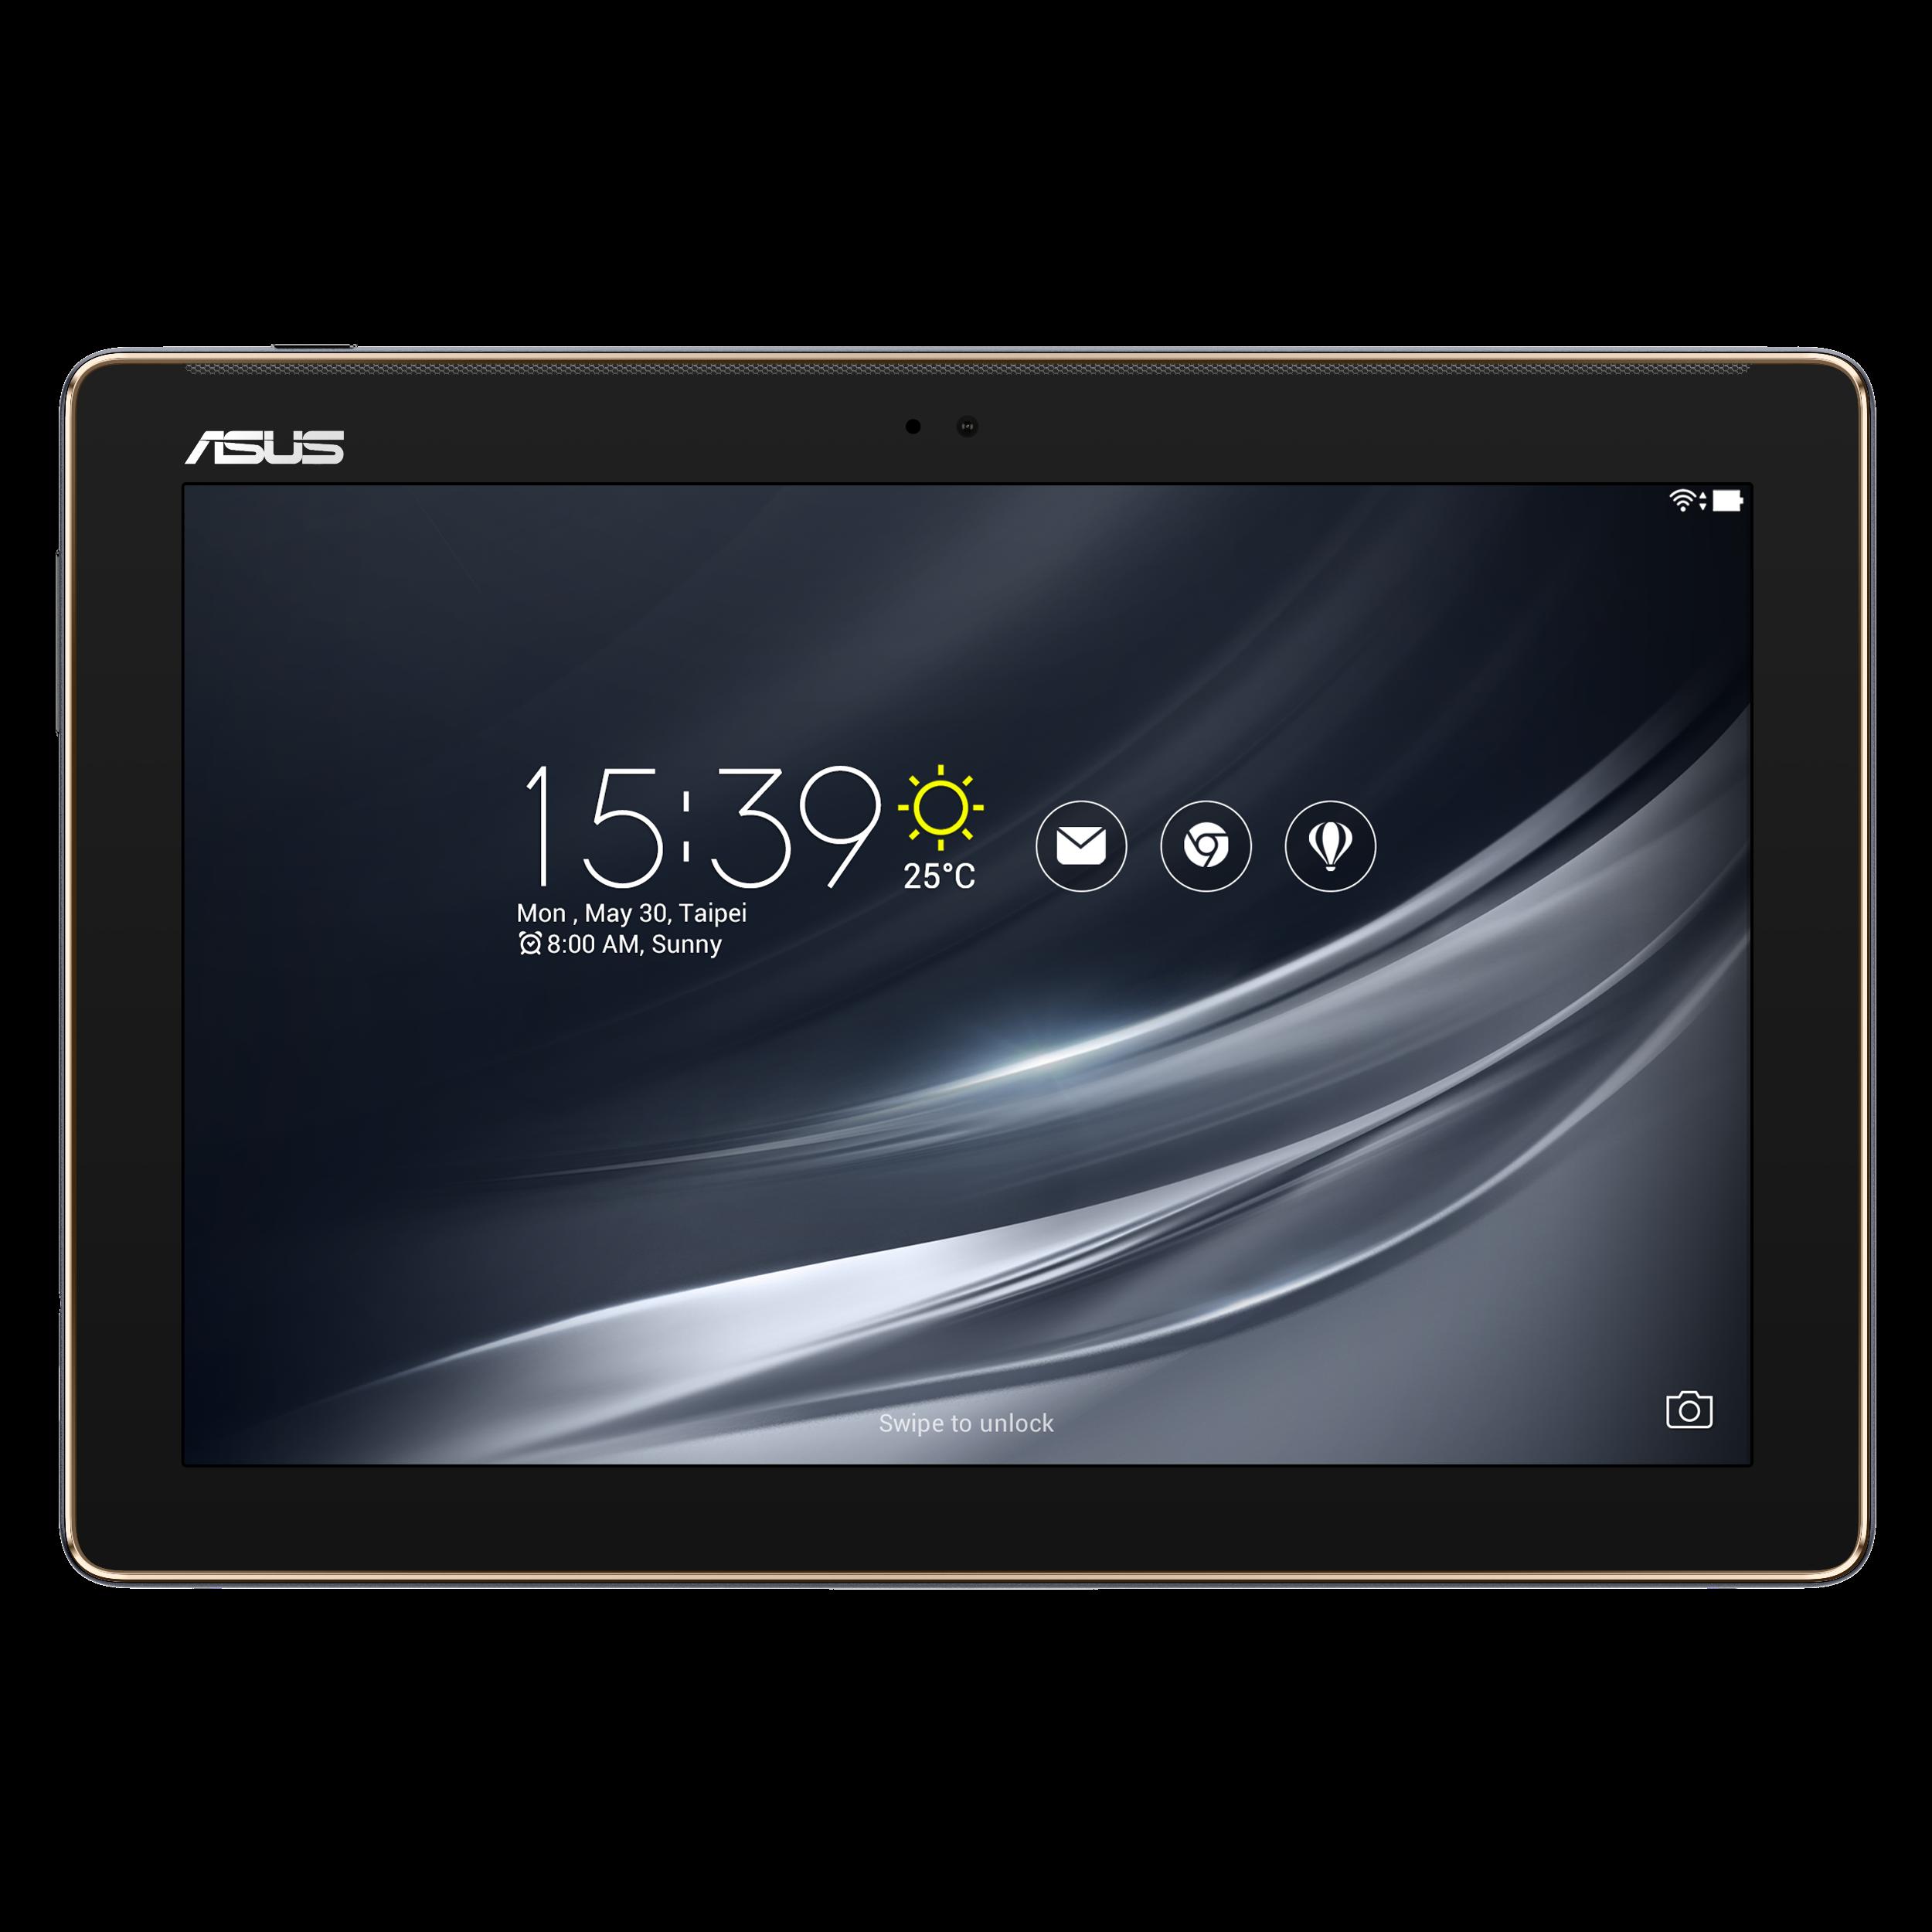 ASUS Zenpad 10.1/MTK8735/32GB/3G/LTE/A N, šedá